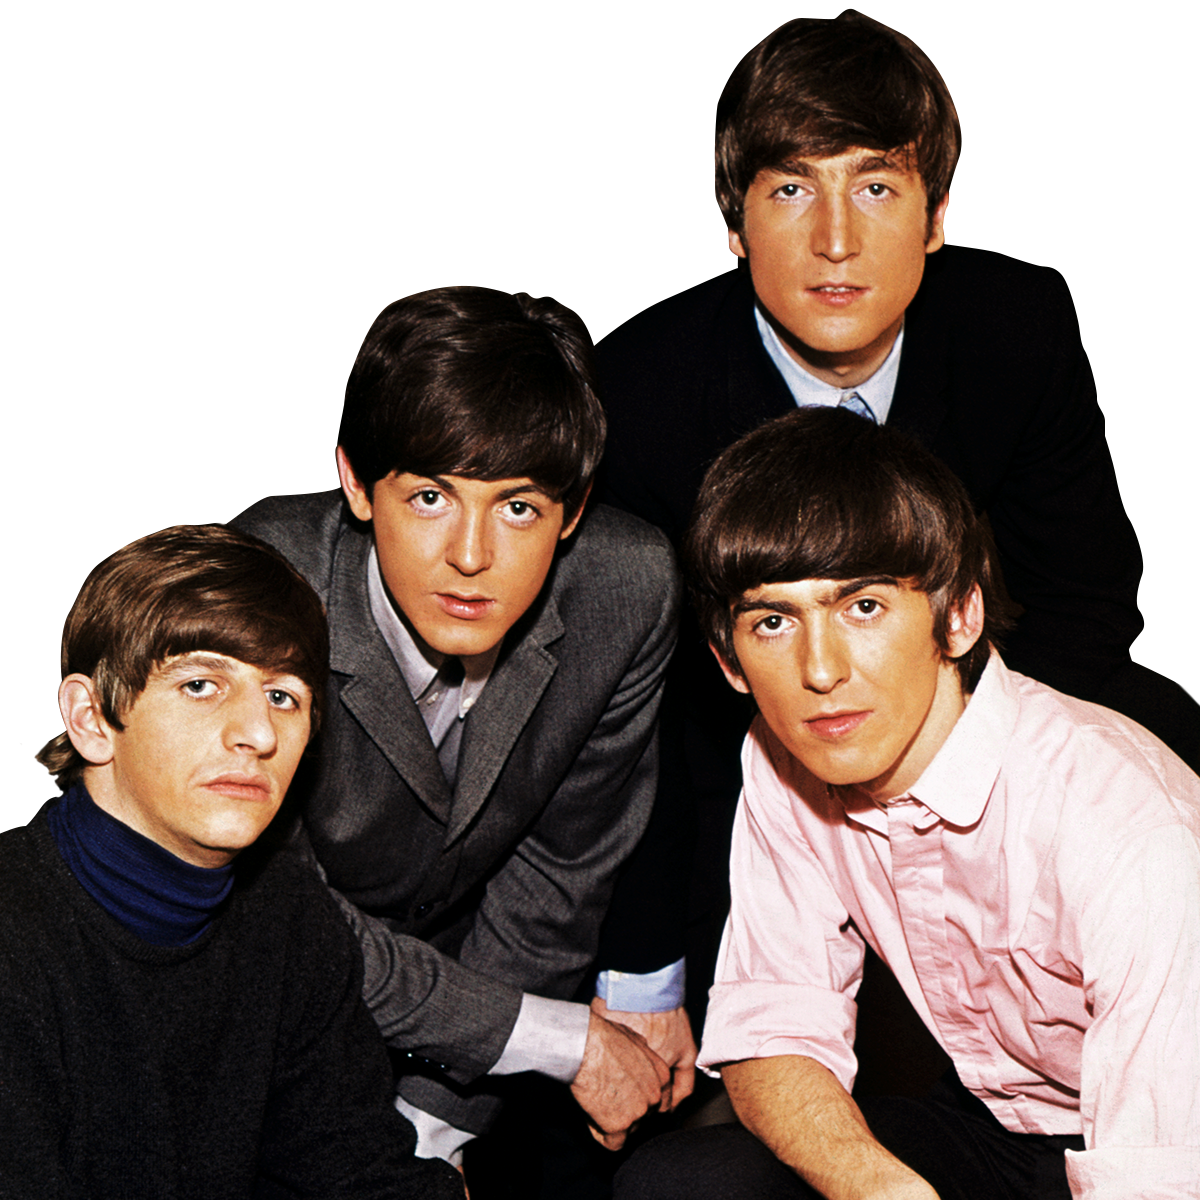 Beatles Spotlight 514890404 Png 1 200 1 200 Pixels John Lennon Paul Mccartney The Beatles Paul Mccartney